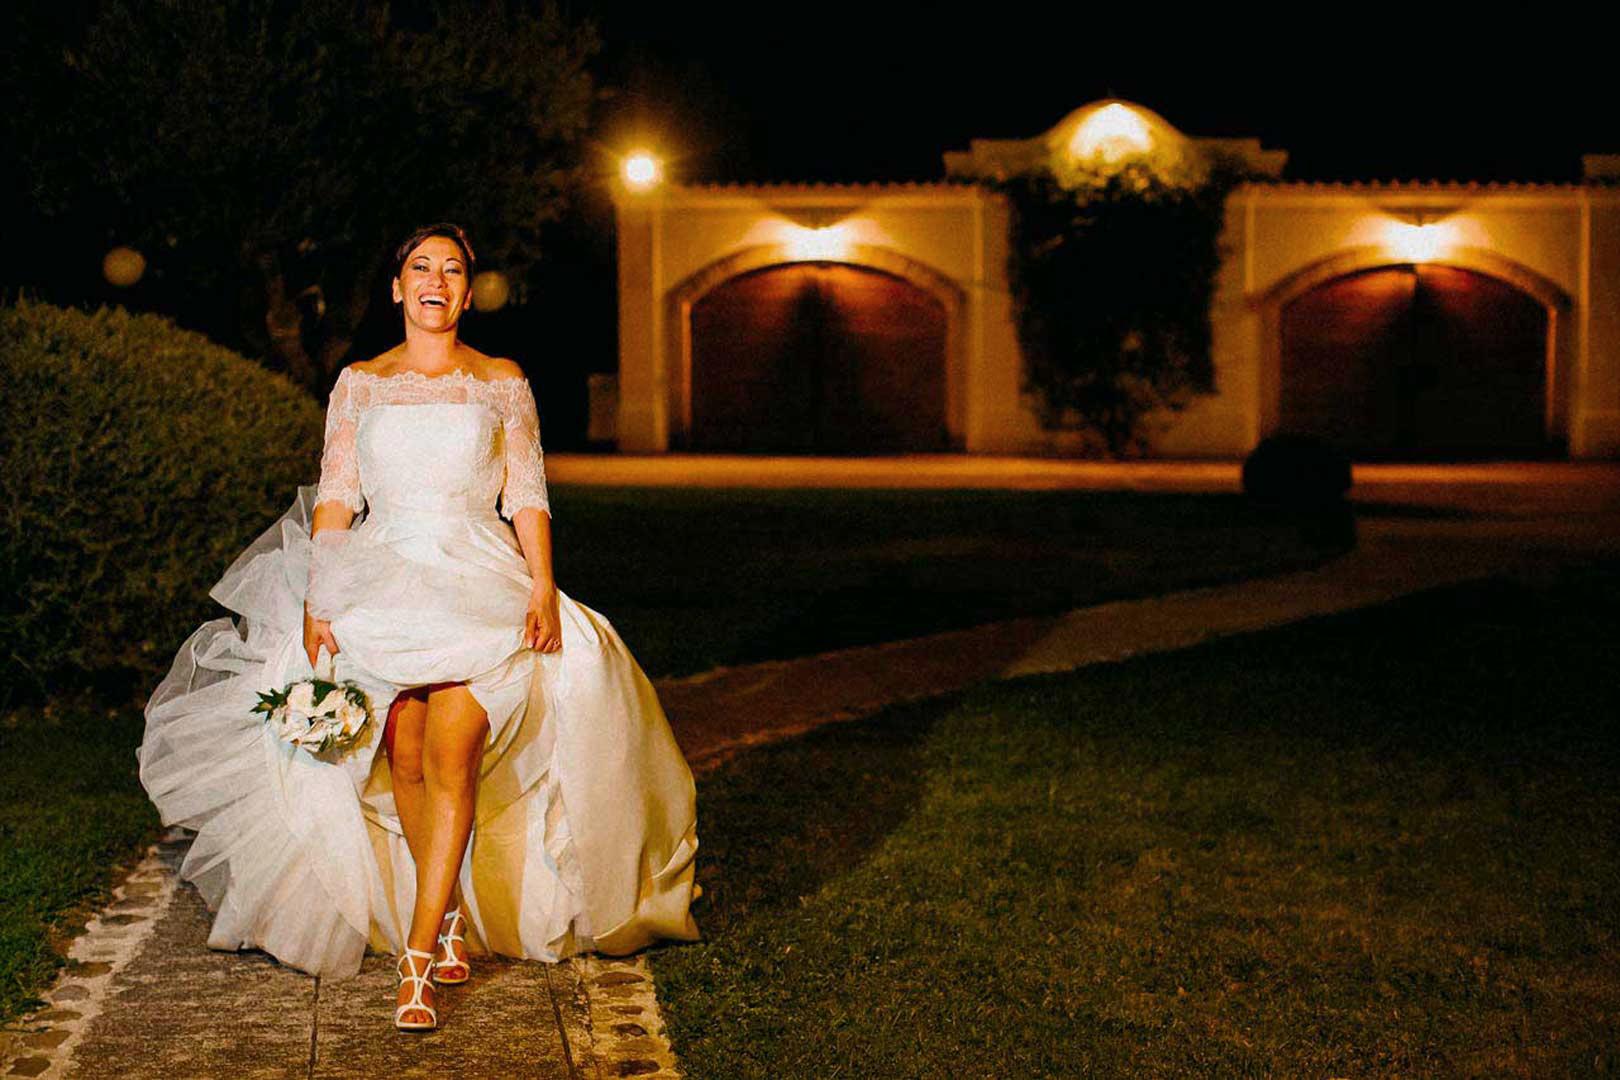 025-abito-sposa-gianni-lepore-fotografo-lucera